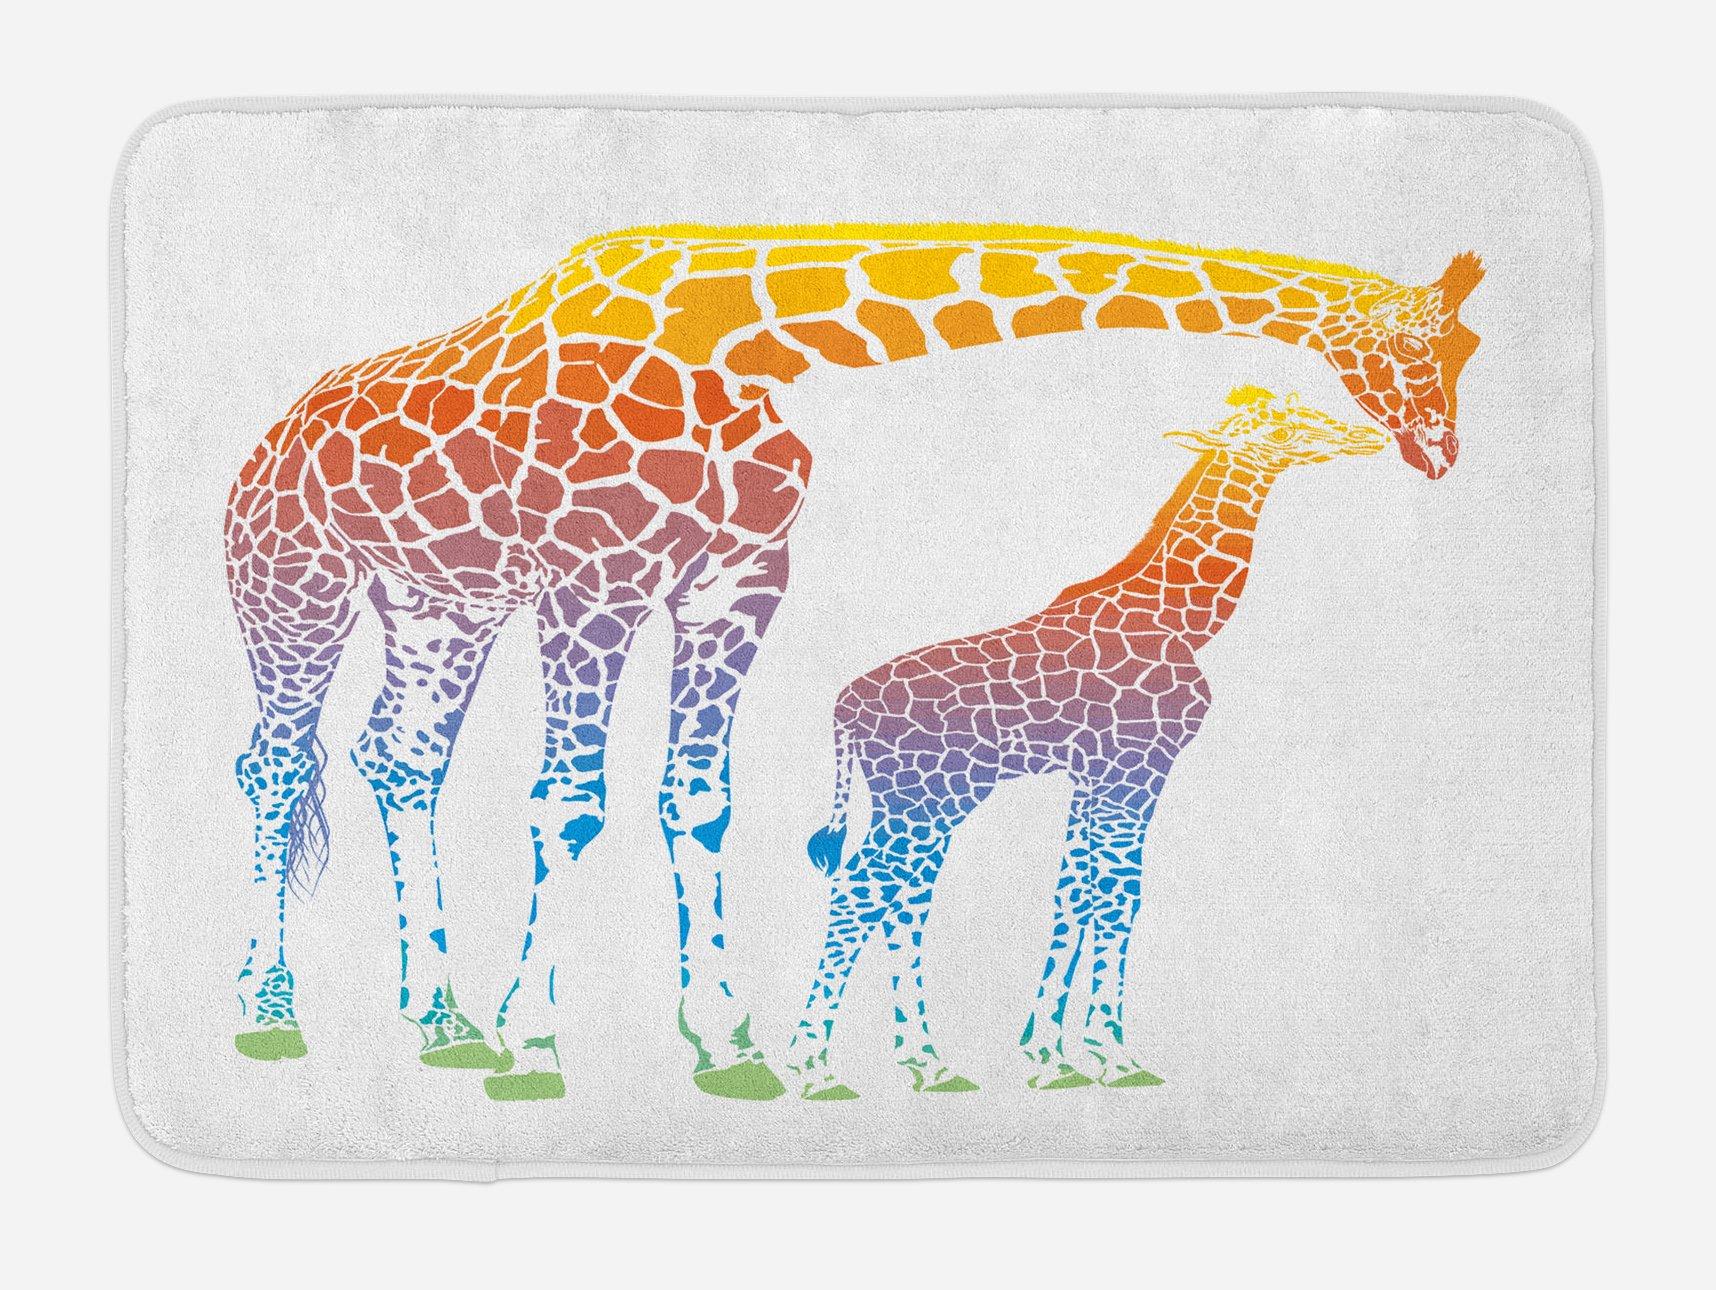 Ambesonne Giraffe Bath Mat, Mom Kid Giraffe in Rainbow Colors Abstract Art Surrealist Image of African Animal, Plush Bathroom Decor Mat with Non Slip Backing, 29.5 W X 17.5 W Inches, Multicolor